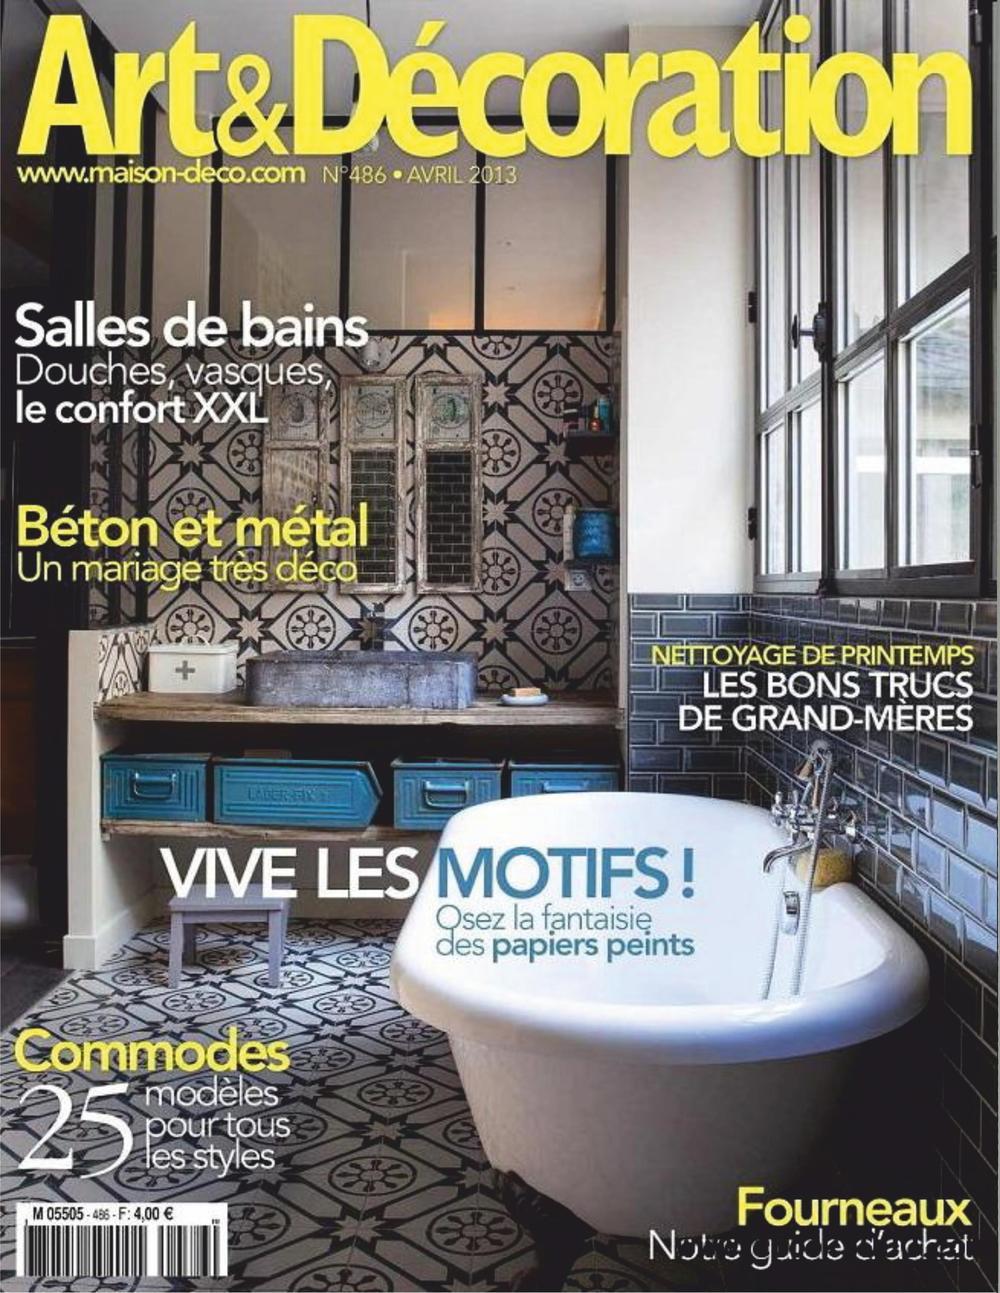 WEWOOD_Artdecoration_press